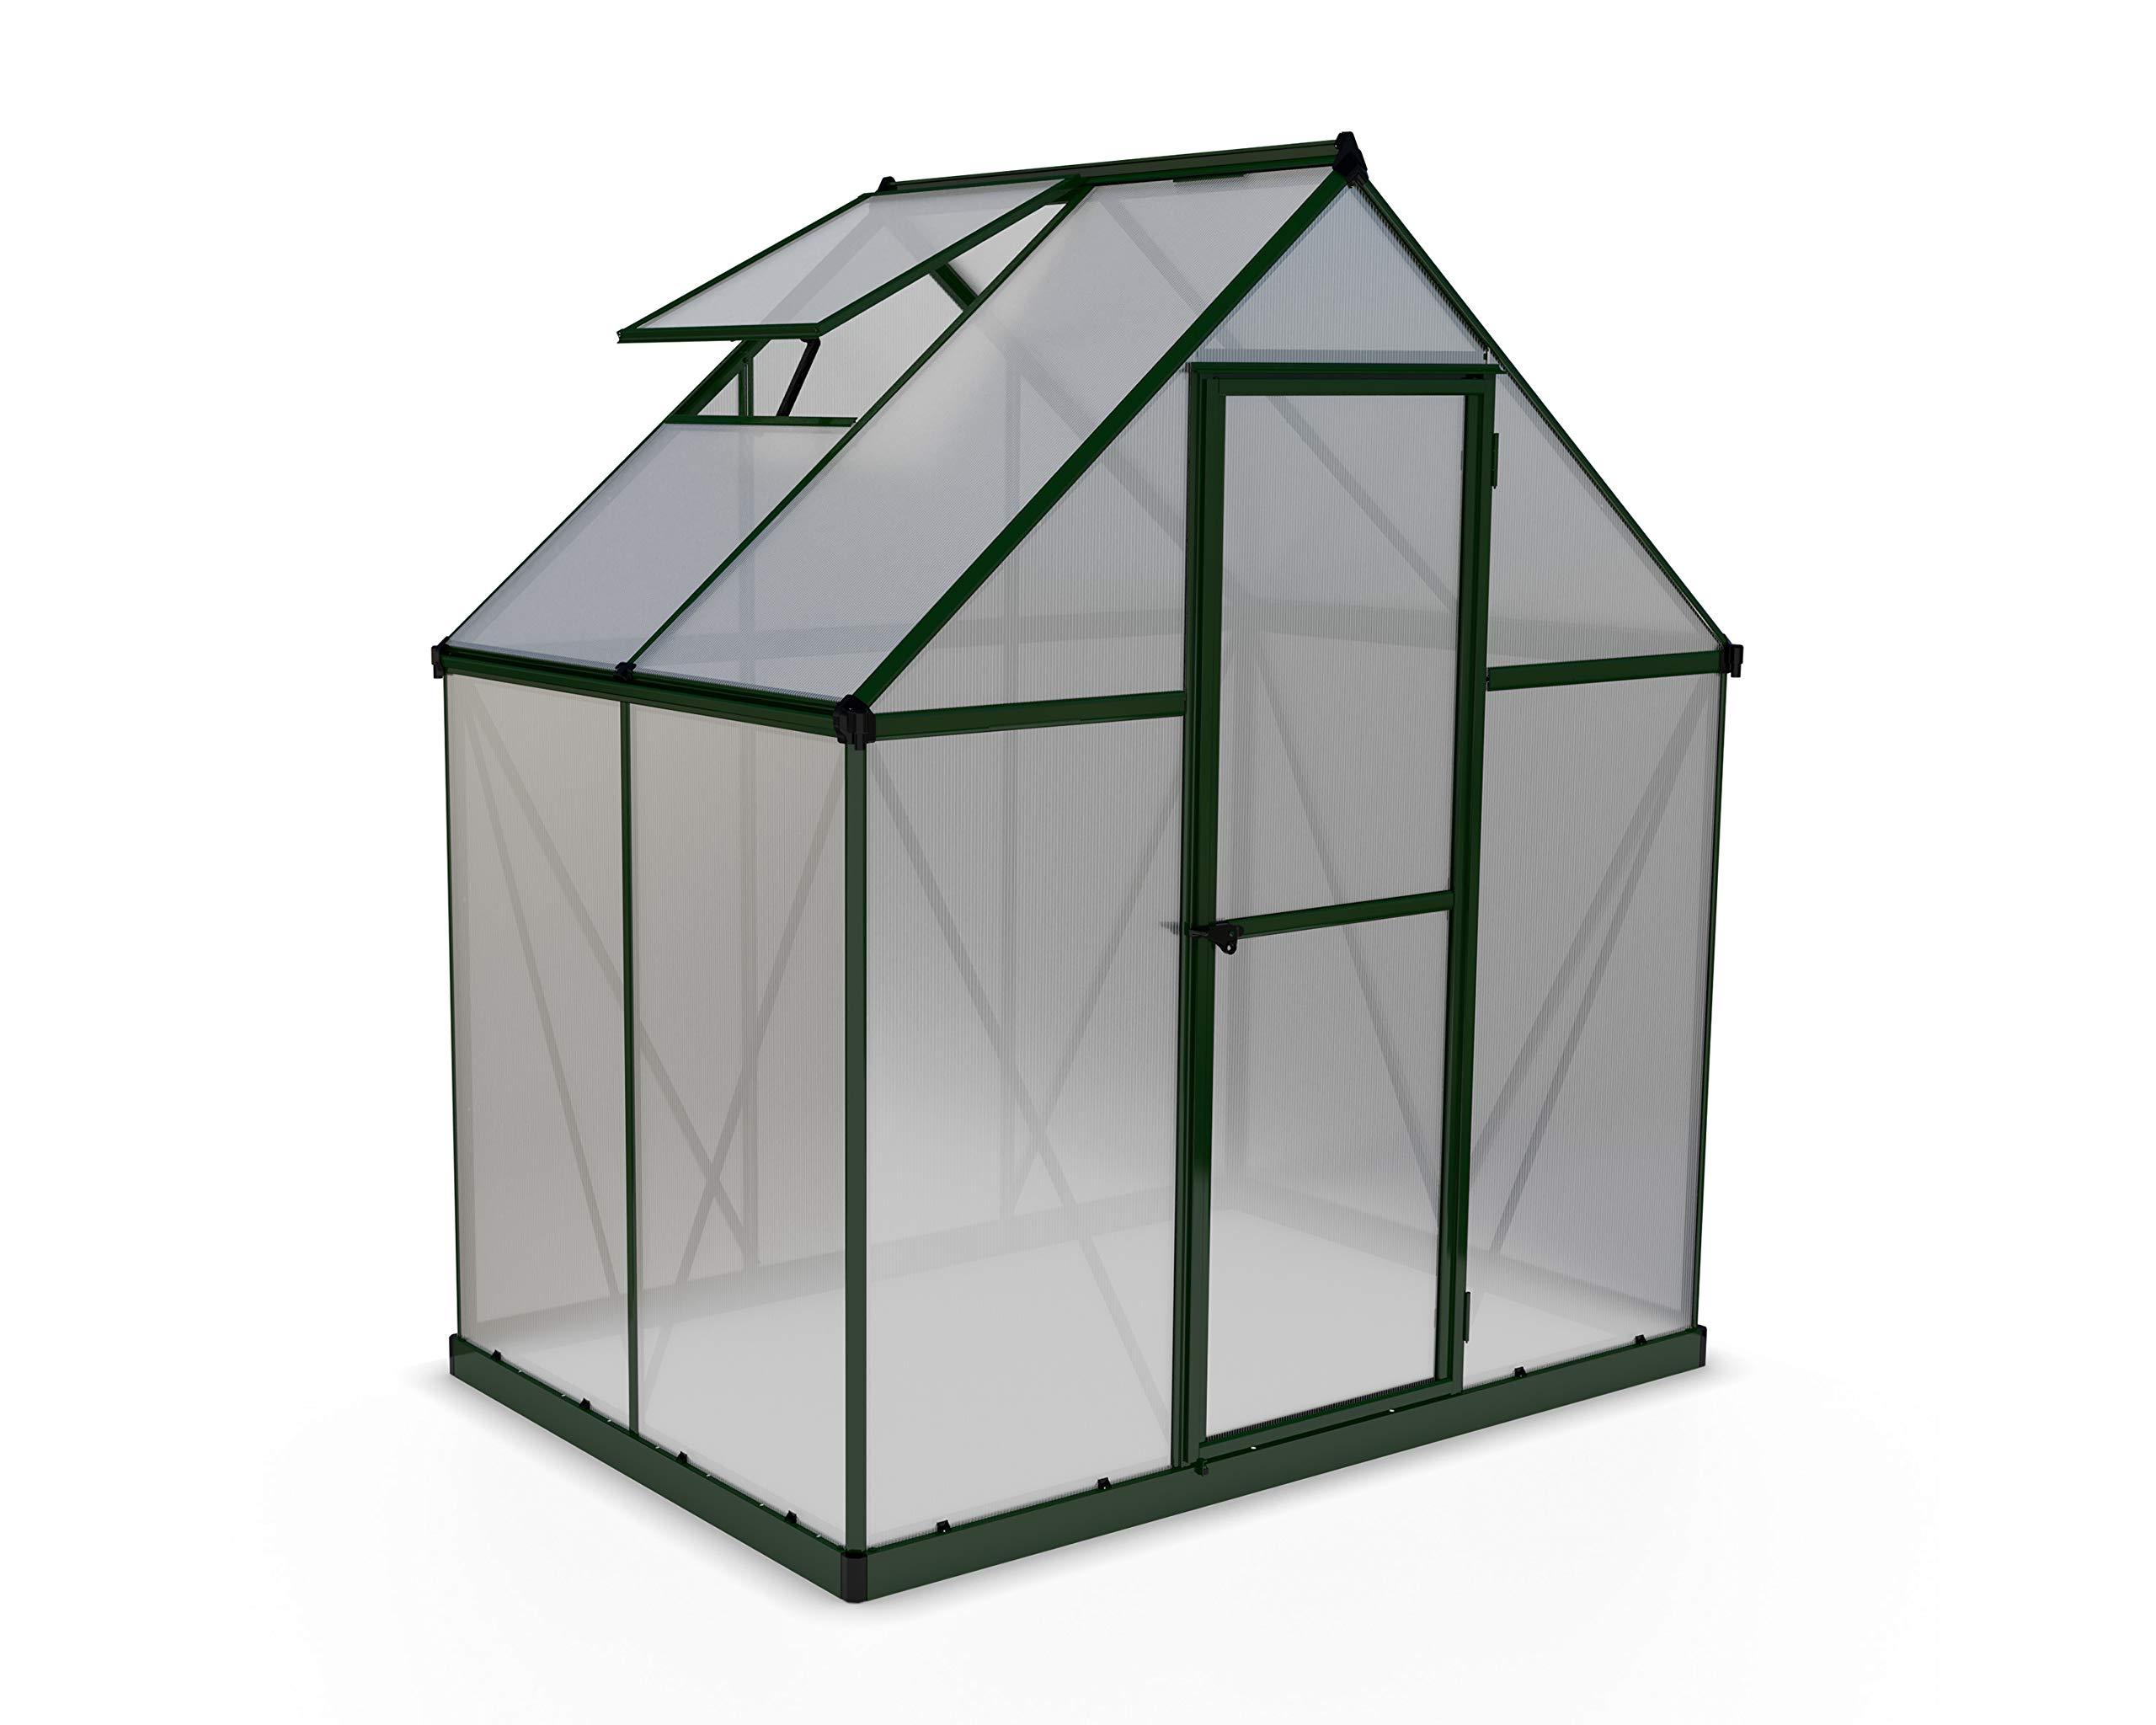 Palram HG5005G Mythos Hobby Greenhouse, 6' x 4' x 7', Forest Green